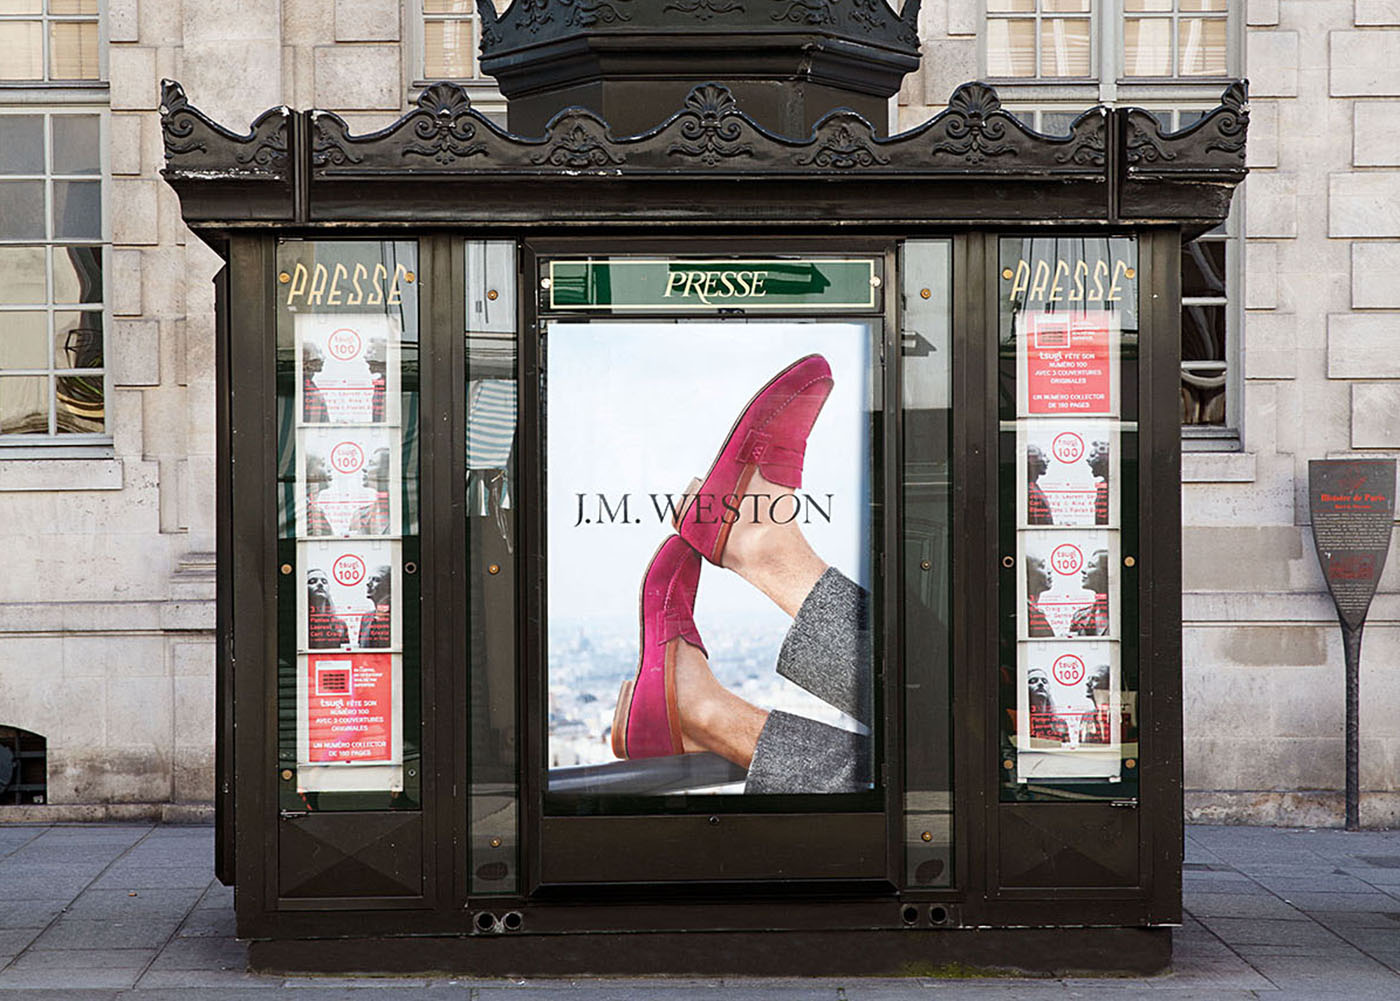 J.M. WESTON Le Moc' 2017. Mocassin Manufacture française Made in France Campagne